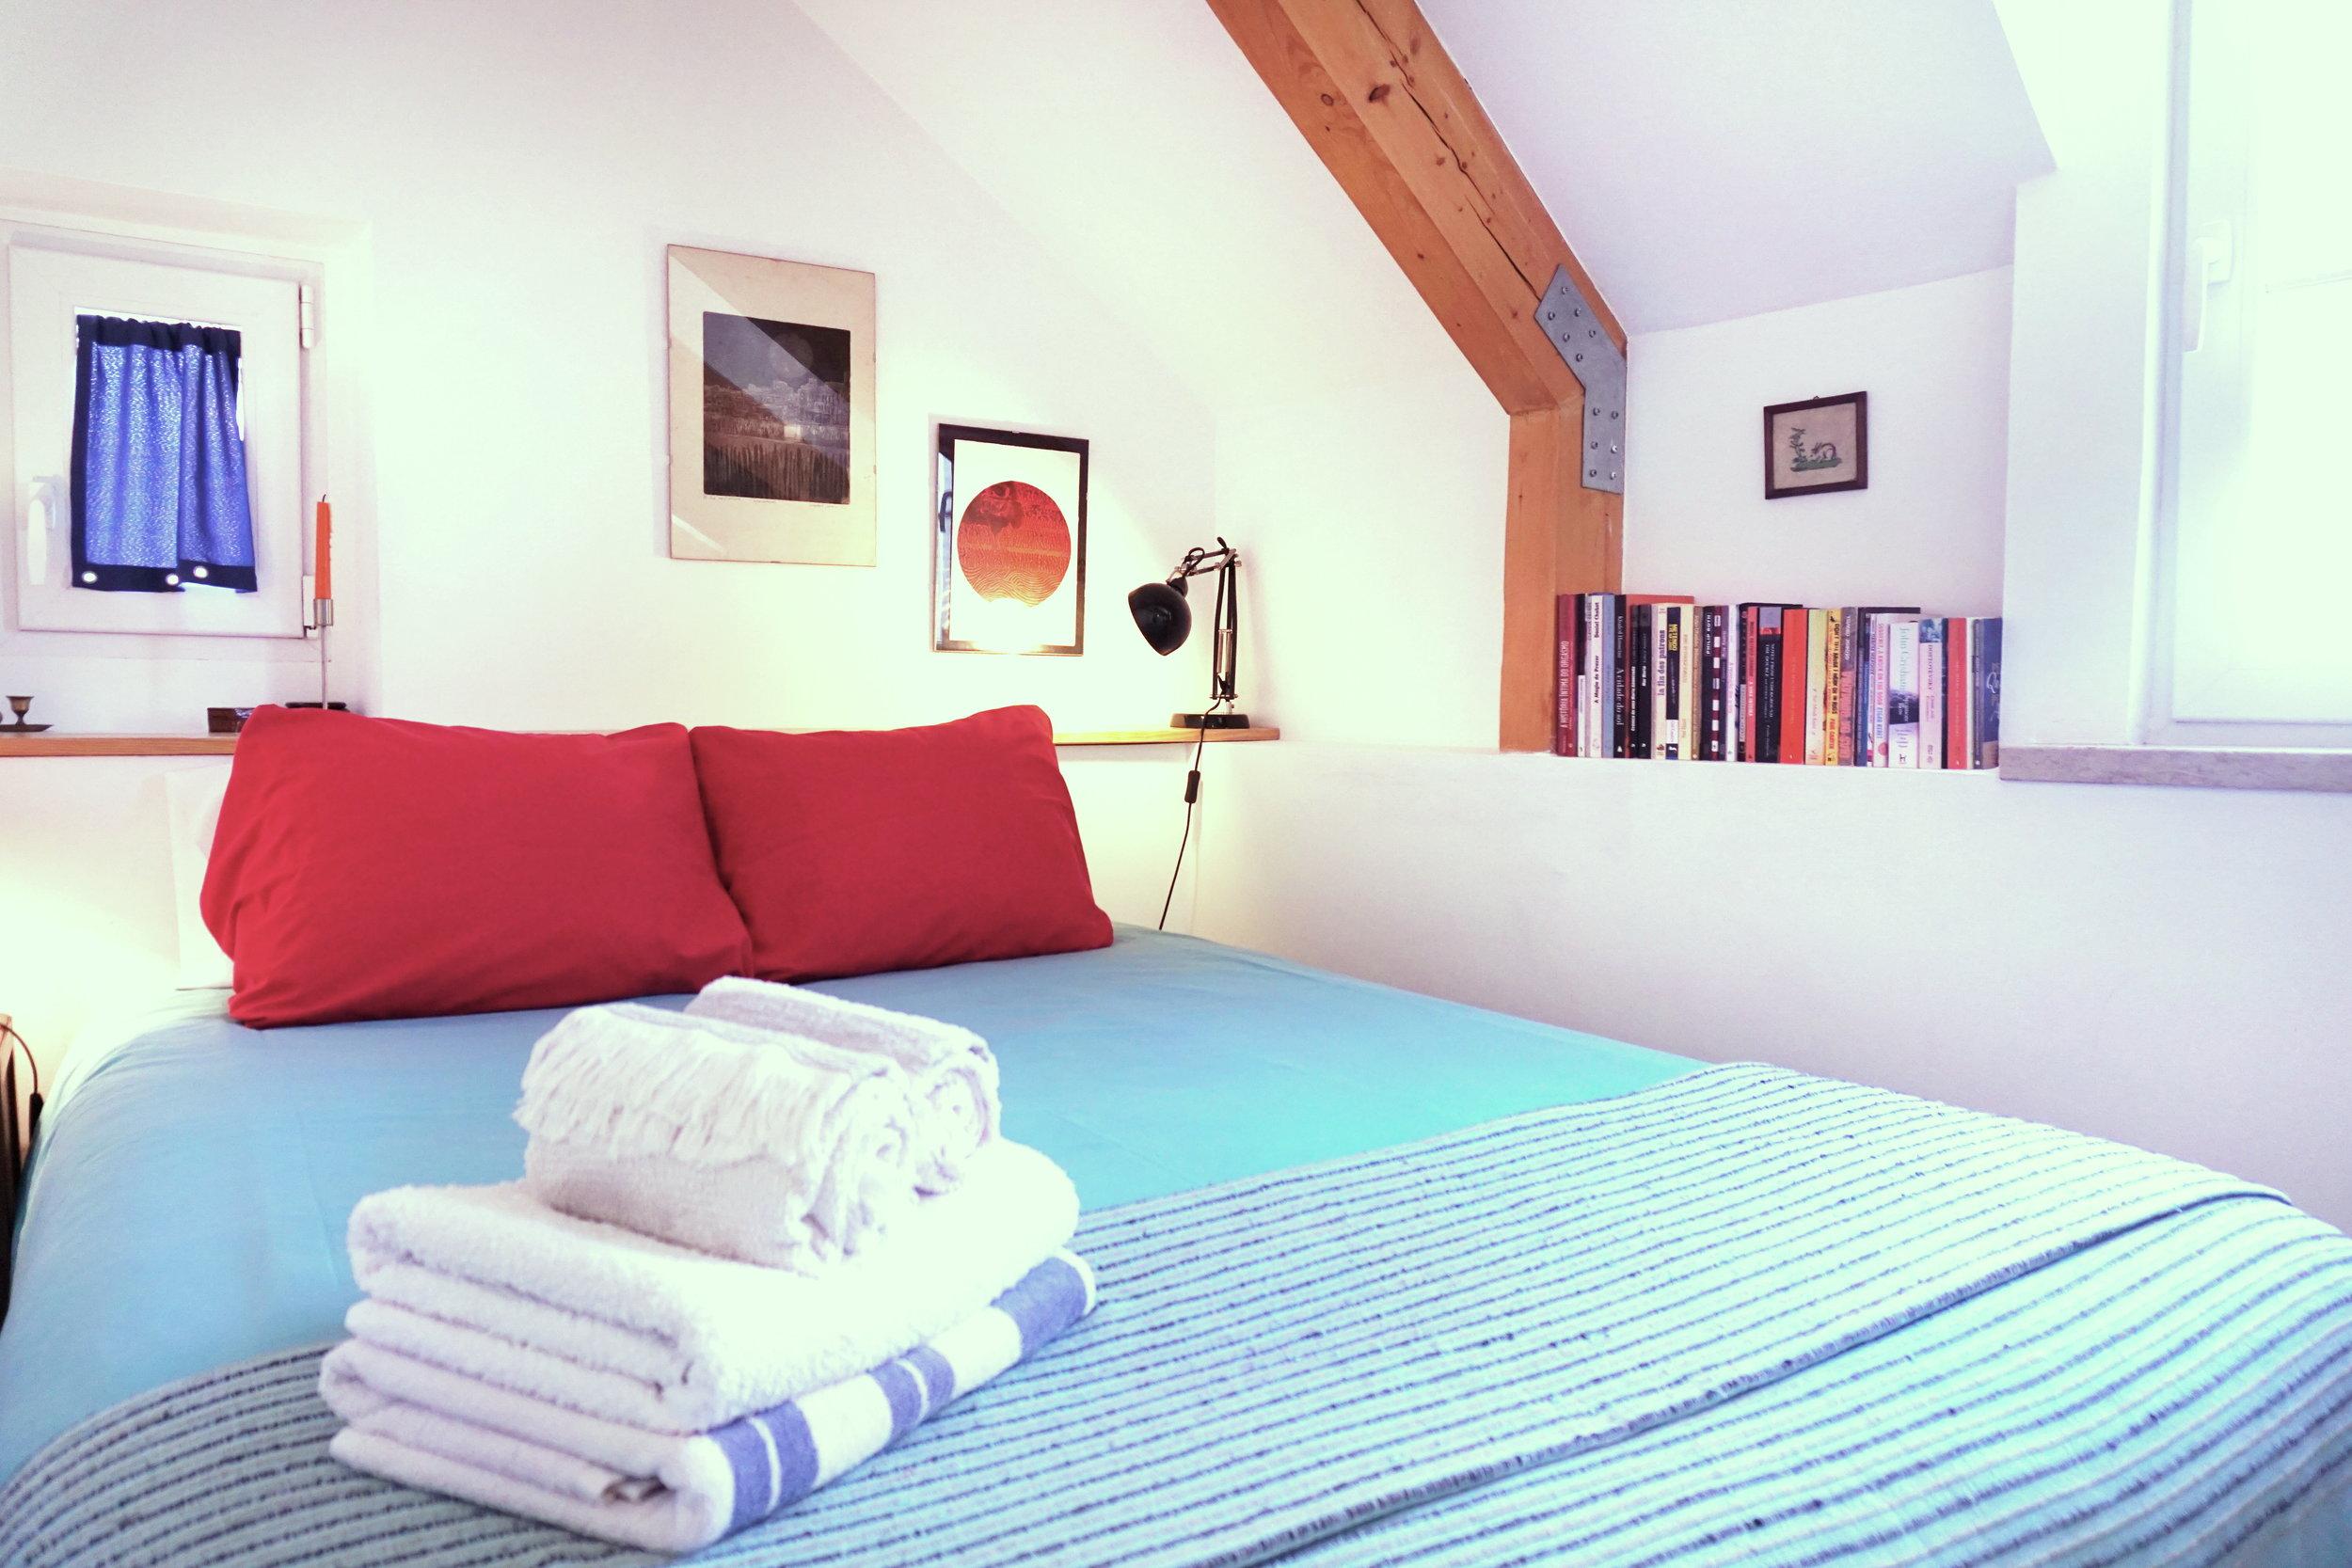 3.1 Bedroom 2-1.jpg